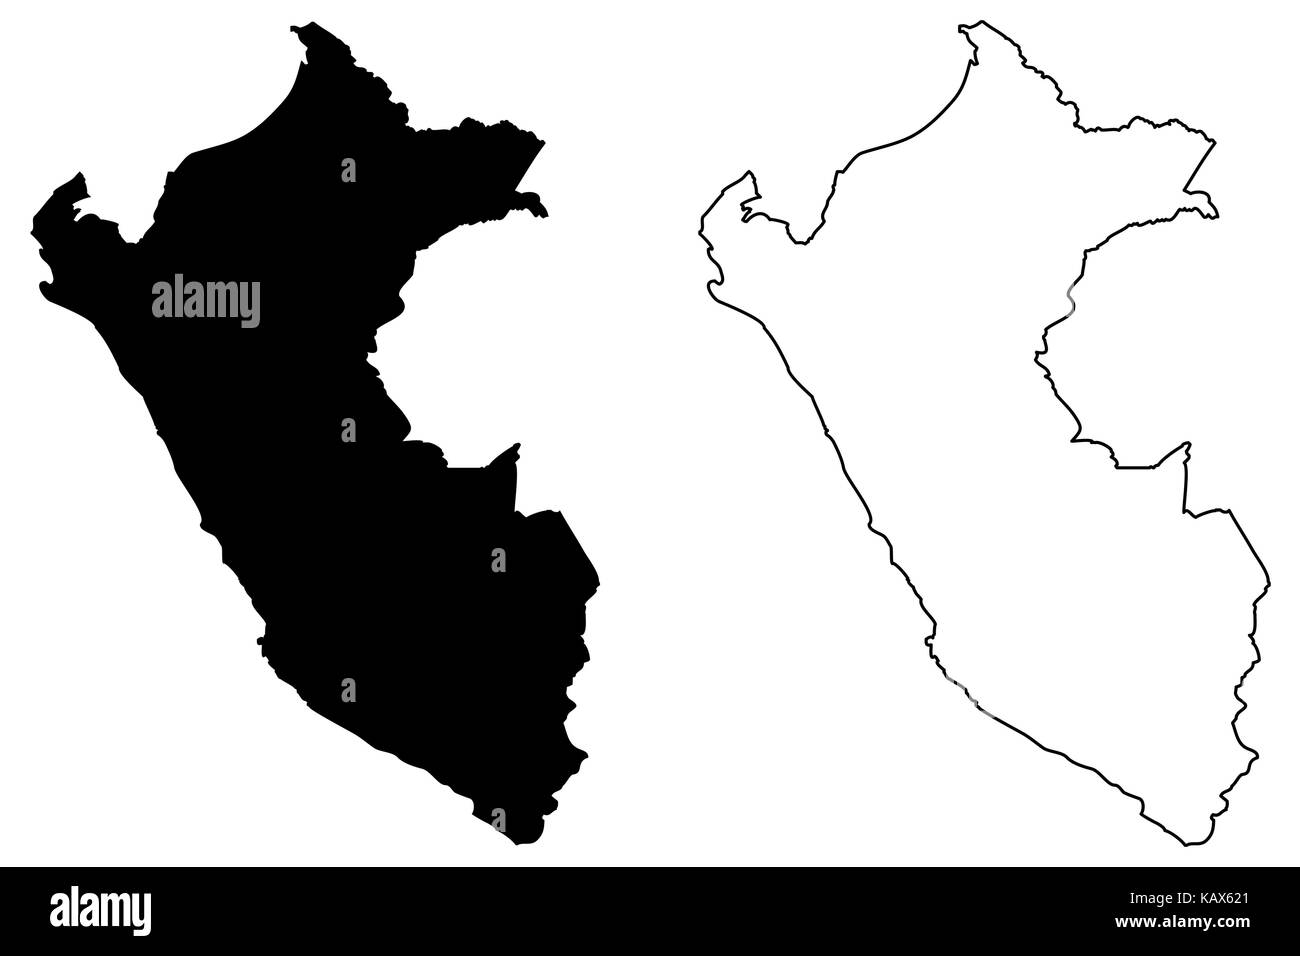 Peru Karte Umriss.Peru Karte Vektor Illustration Kritzeln Skizze Peru Vektor